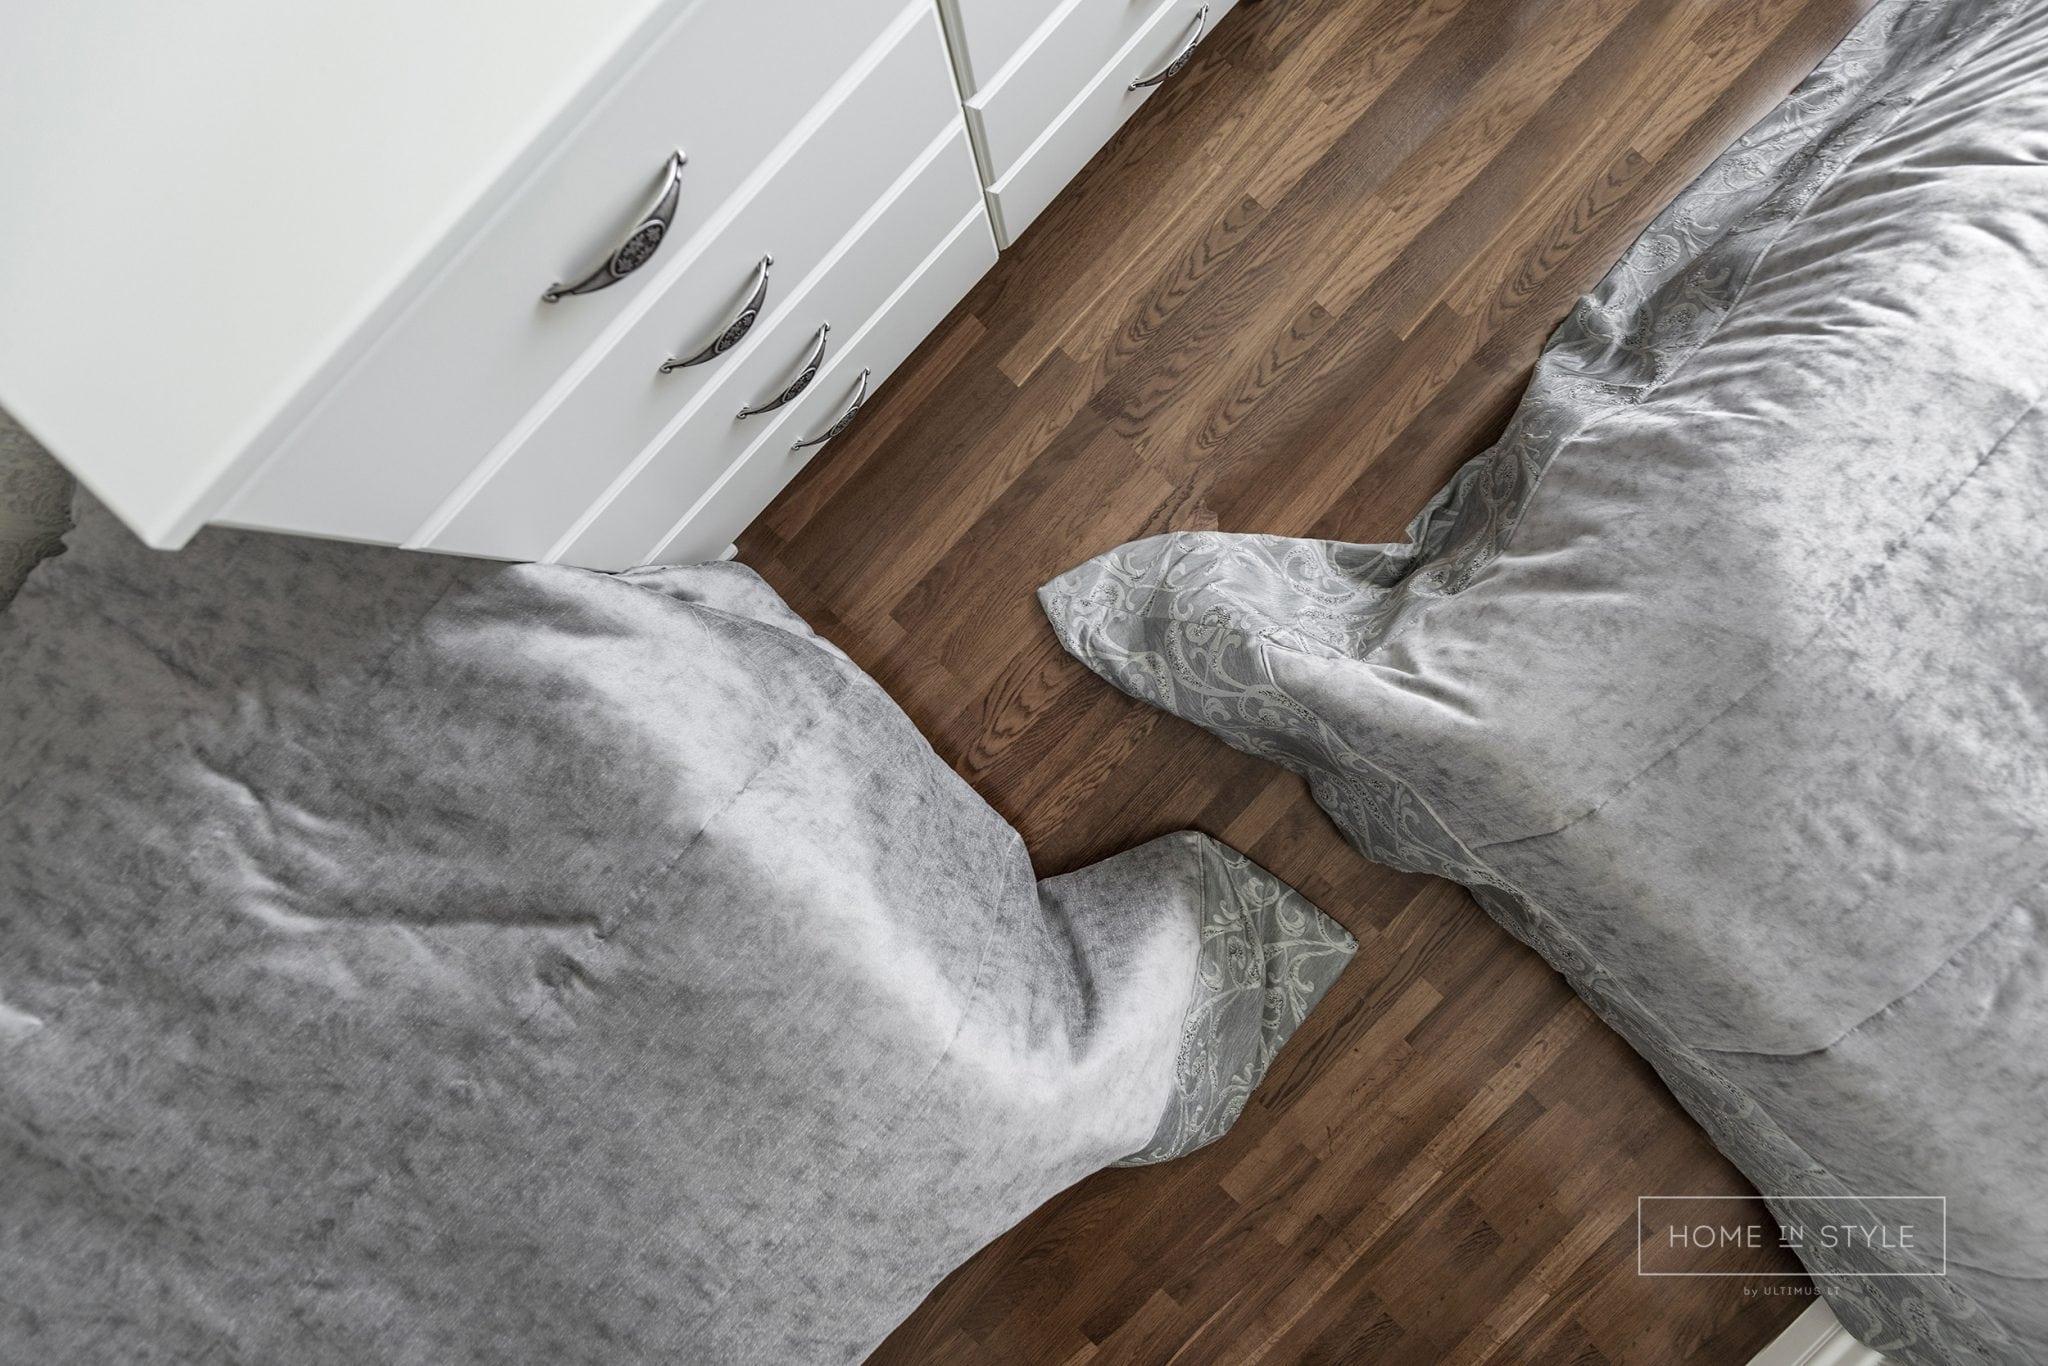 Klasikinis interjeras miegamojo baldu gamyba Home in style